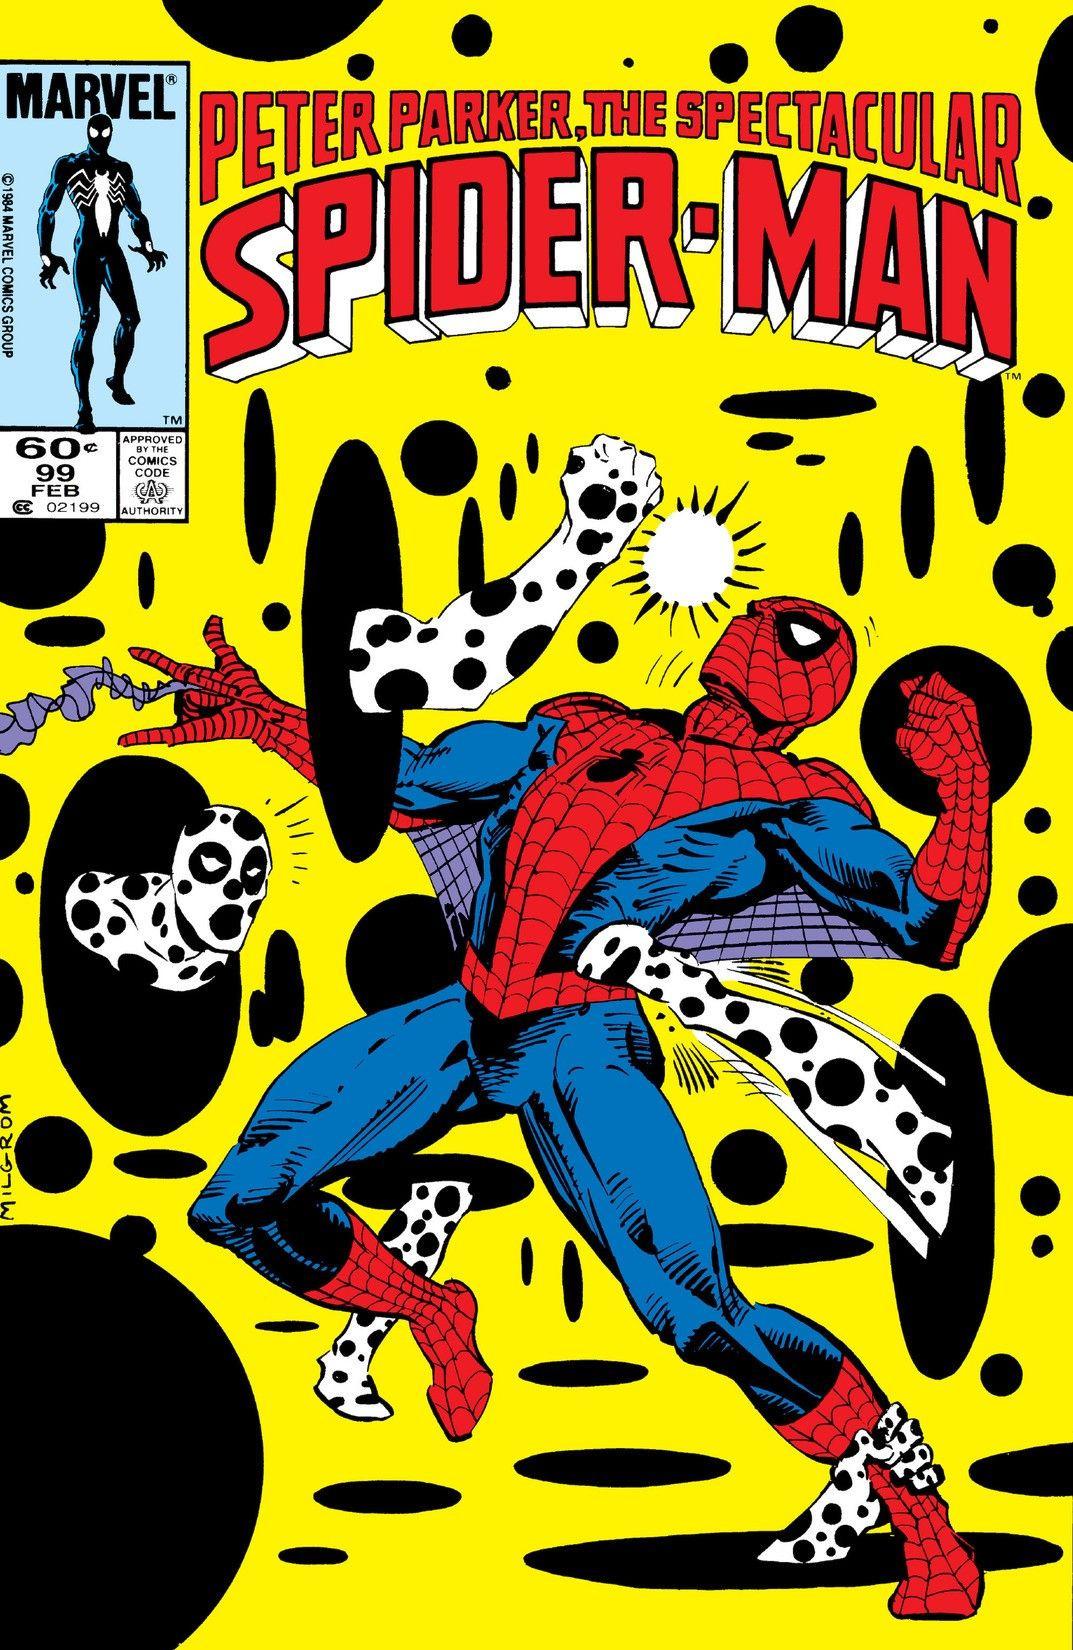 Peter Parker, The Spectacular Spider-Man Vol 1 99